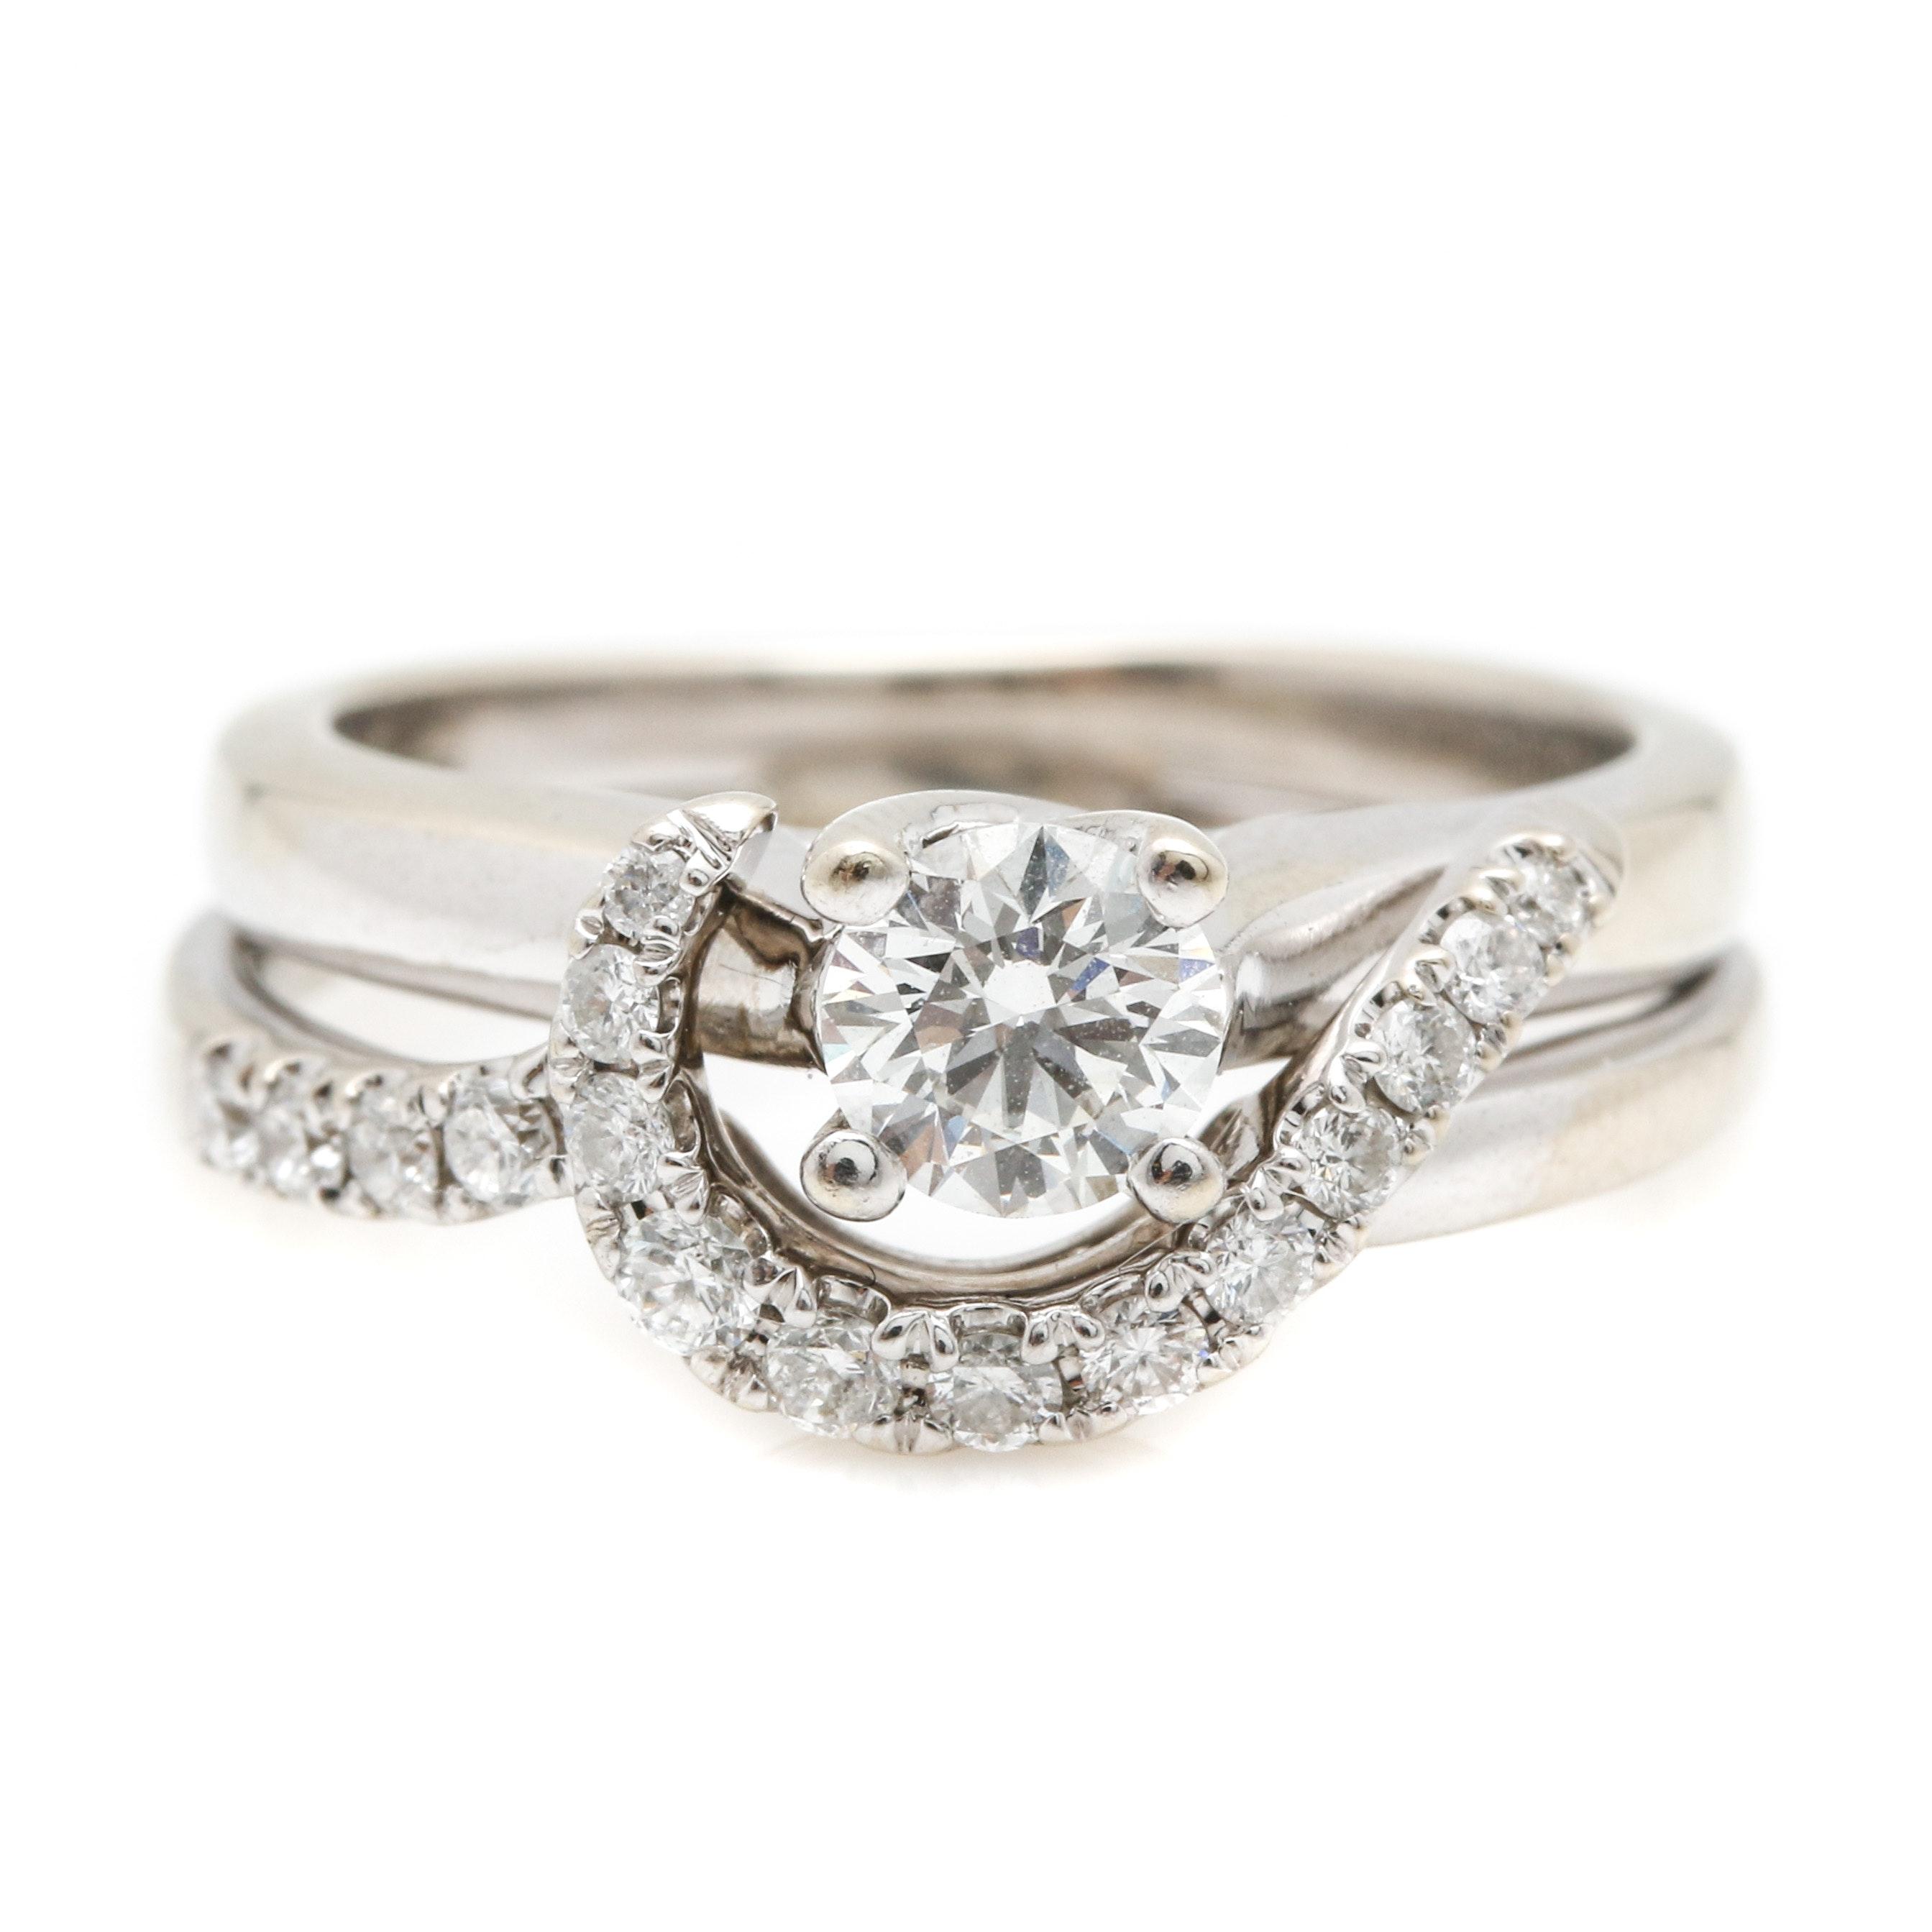 18k white gold helzberg engagement ring with 14k